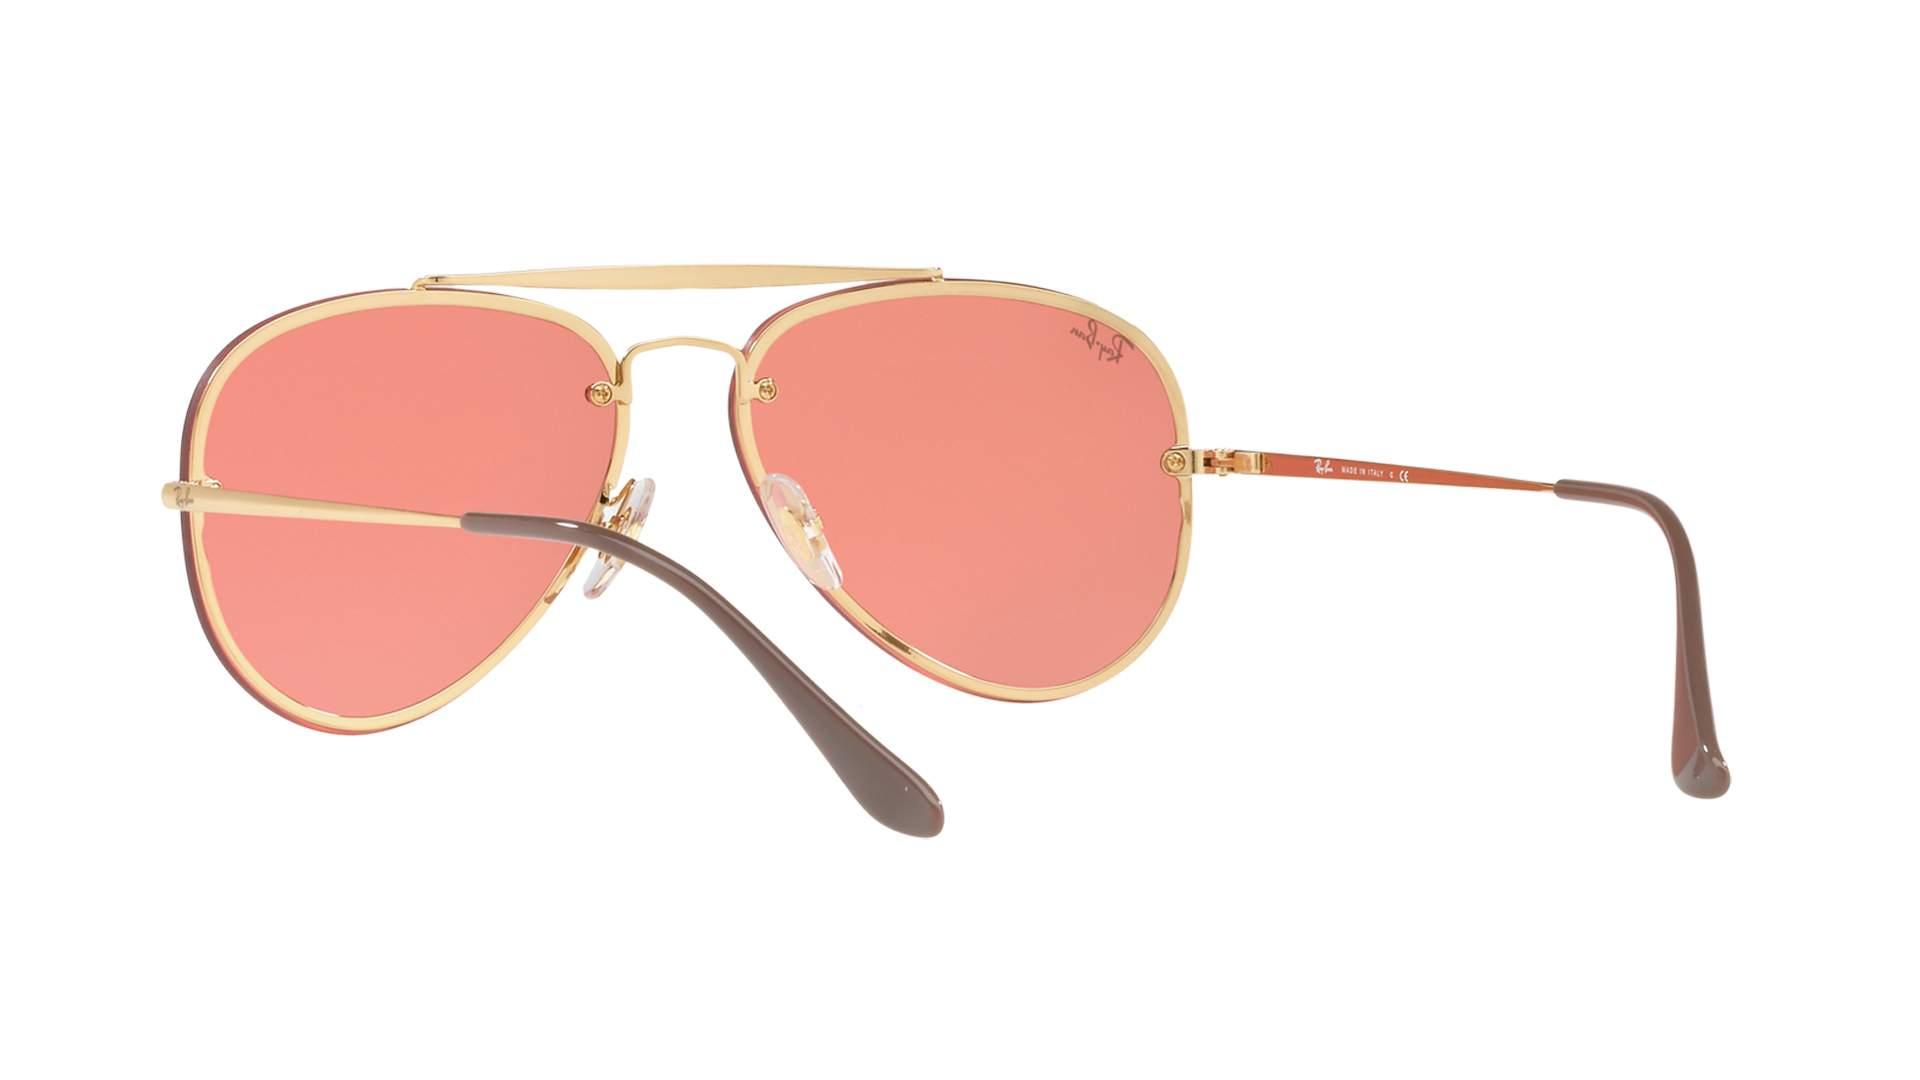 Sunglasses Ray-Ban Blaze Aviator Gold RB3584N 9052 E4 58-13 Medium Mirror 25932ae12716